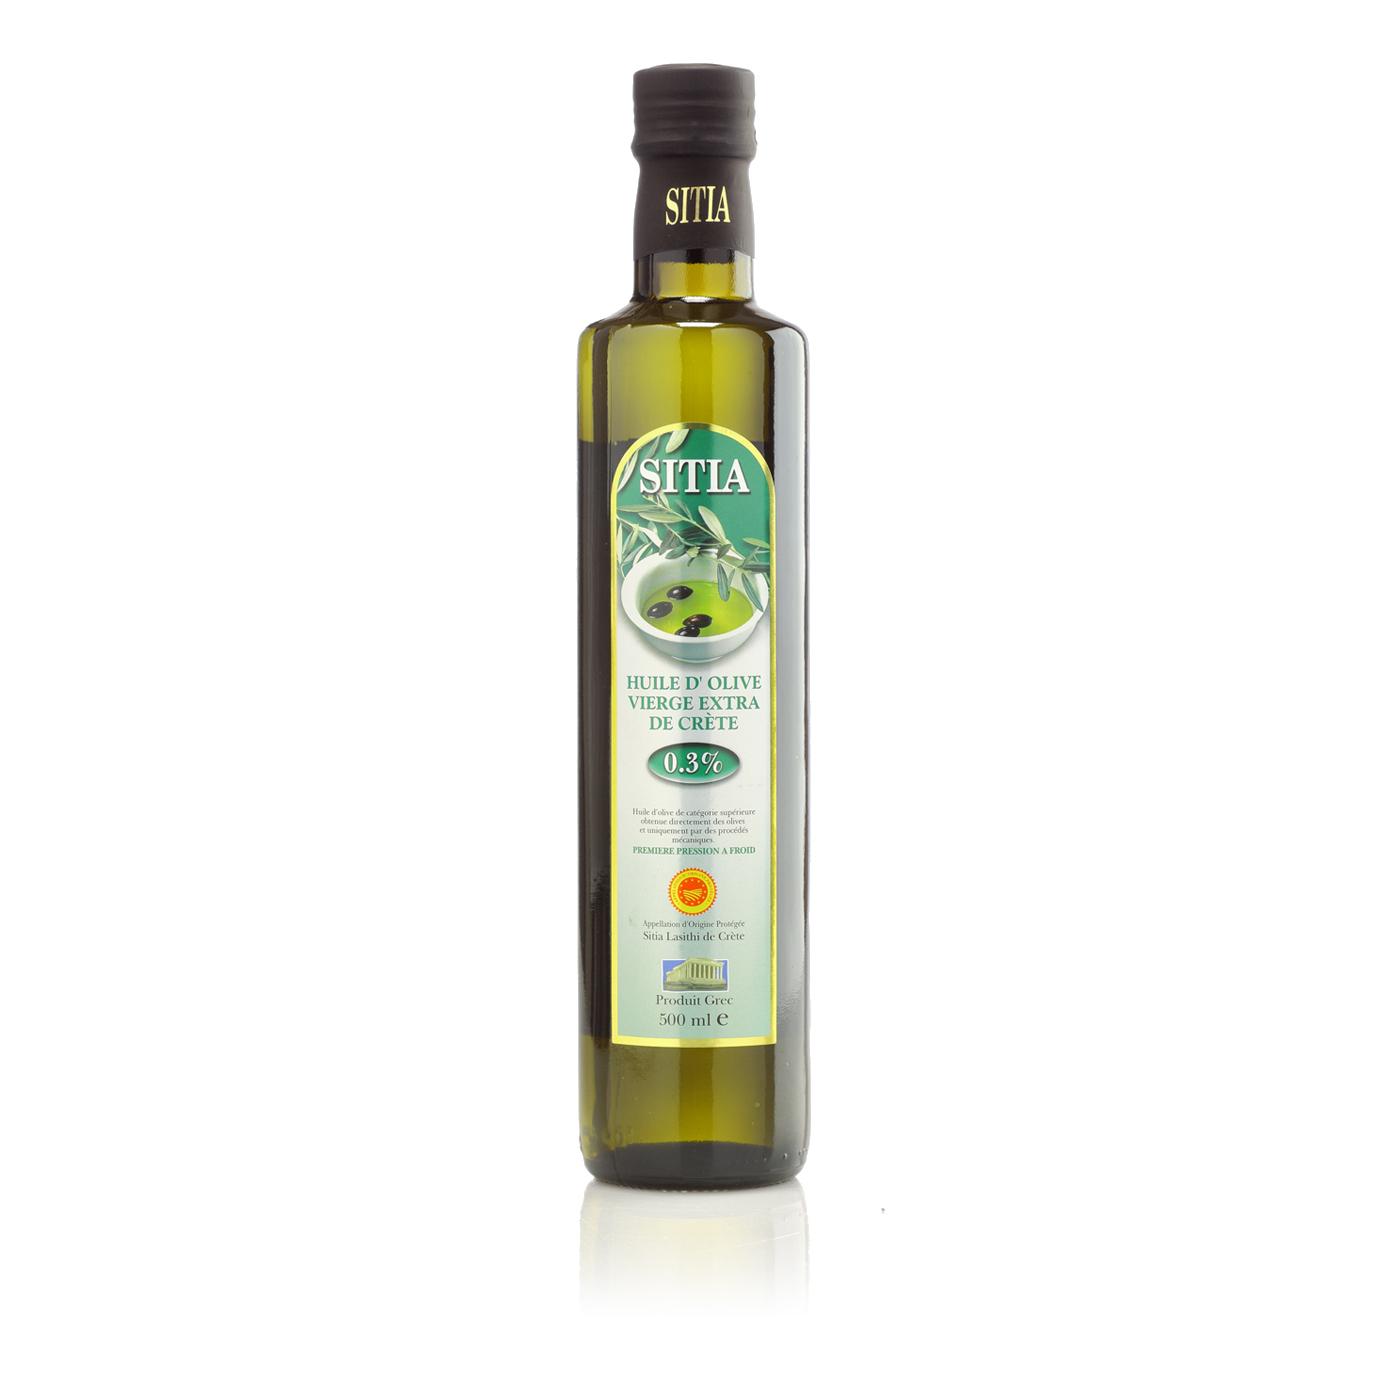 Масло оливковое SITIA P.D.O. Extra Virgin 0,3% 500 мл масло оливковое farchioni extra virgin di oliva 500 мл